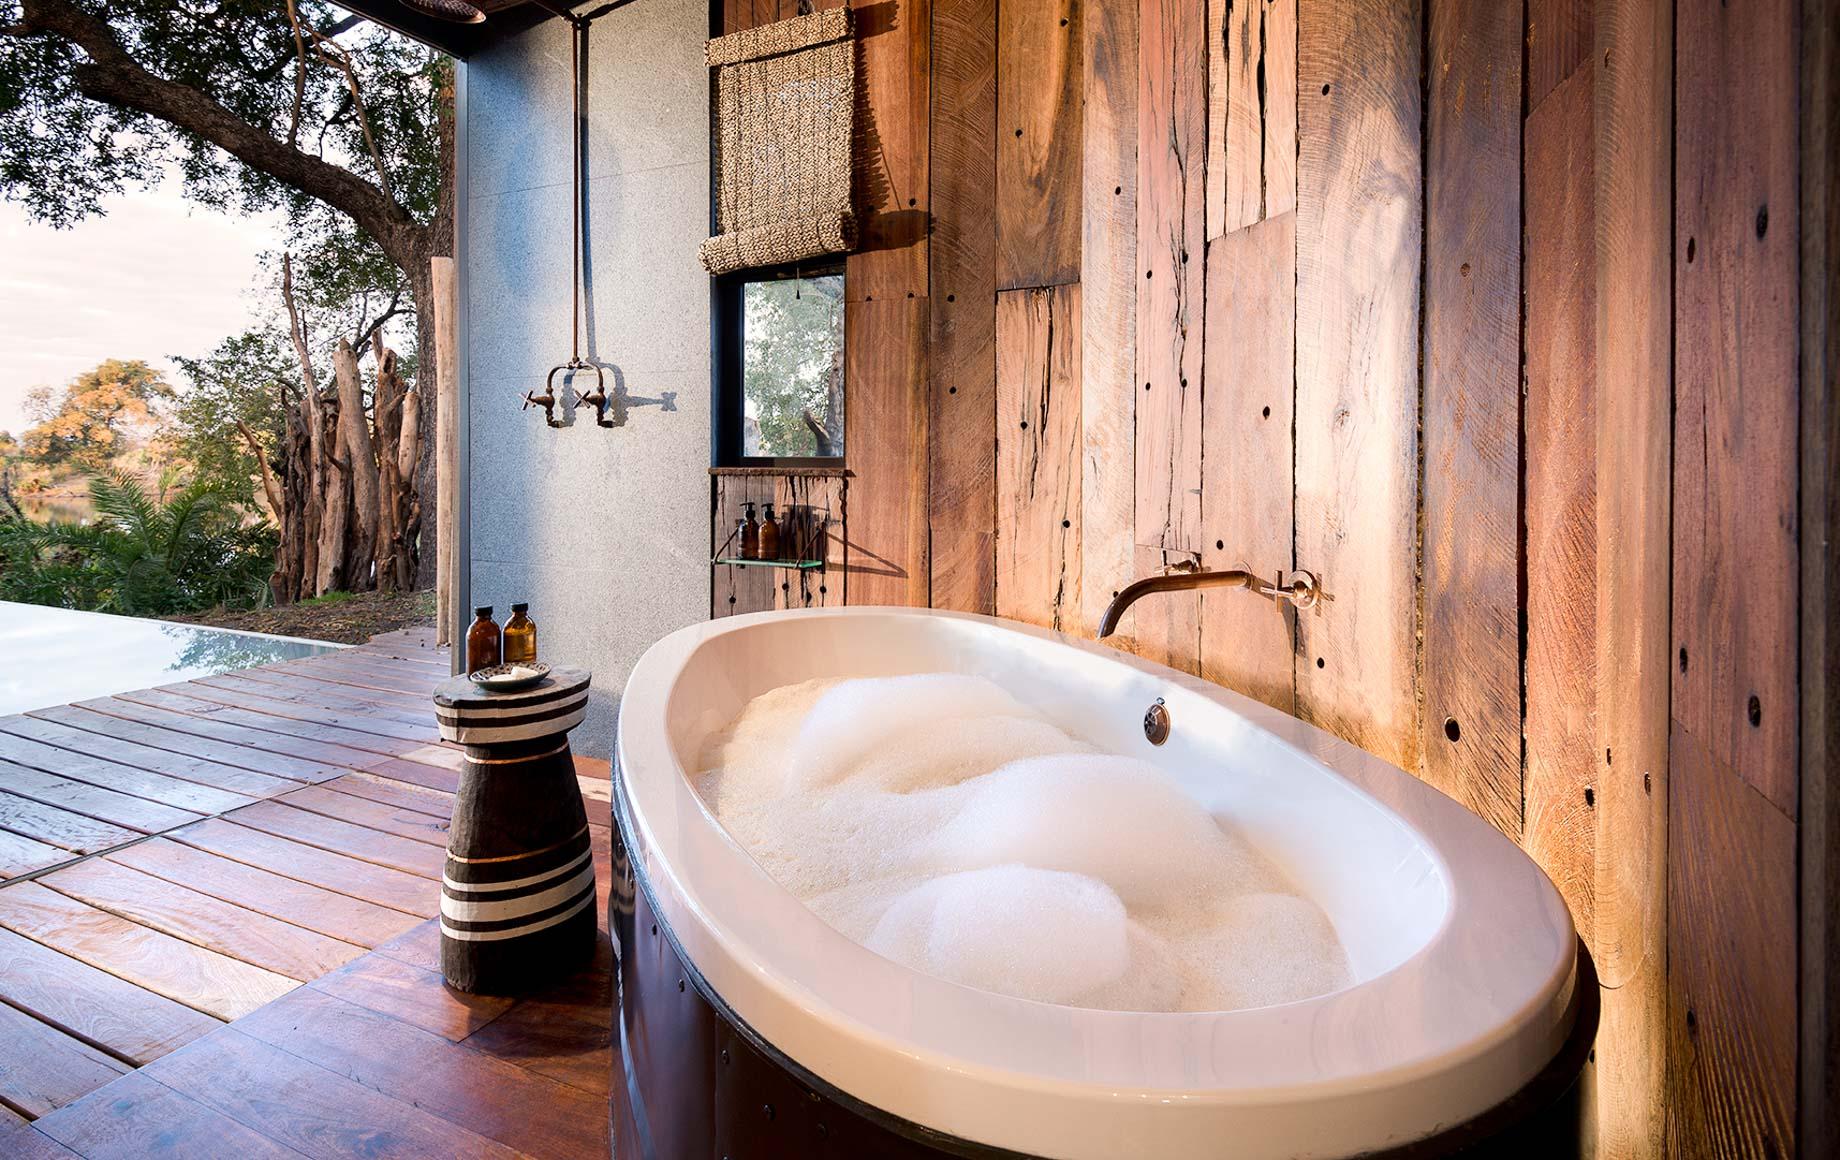 Tub prepared for bubble bath at Thorntree River Lodge